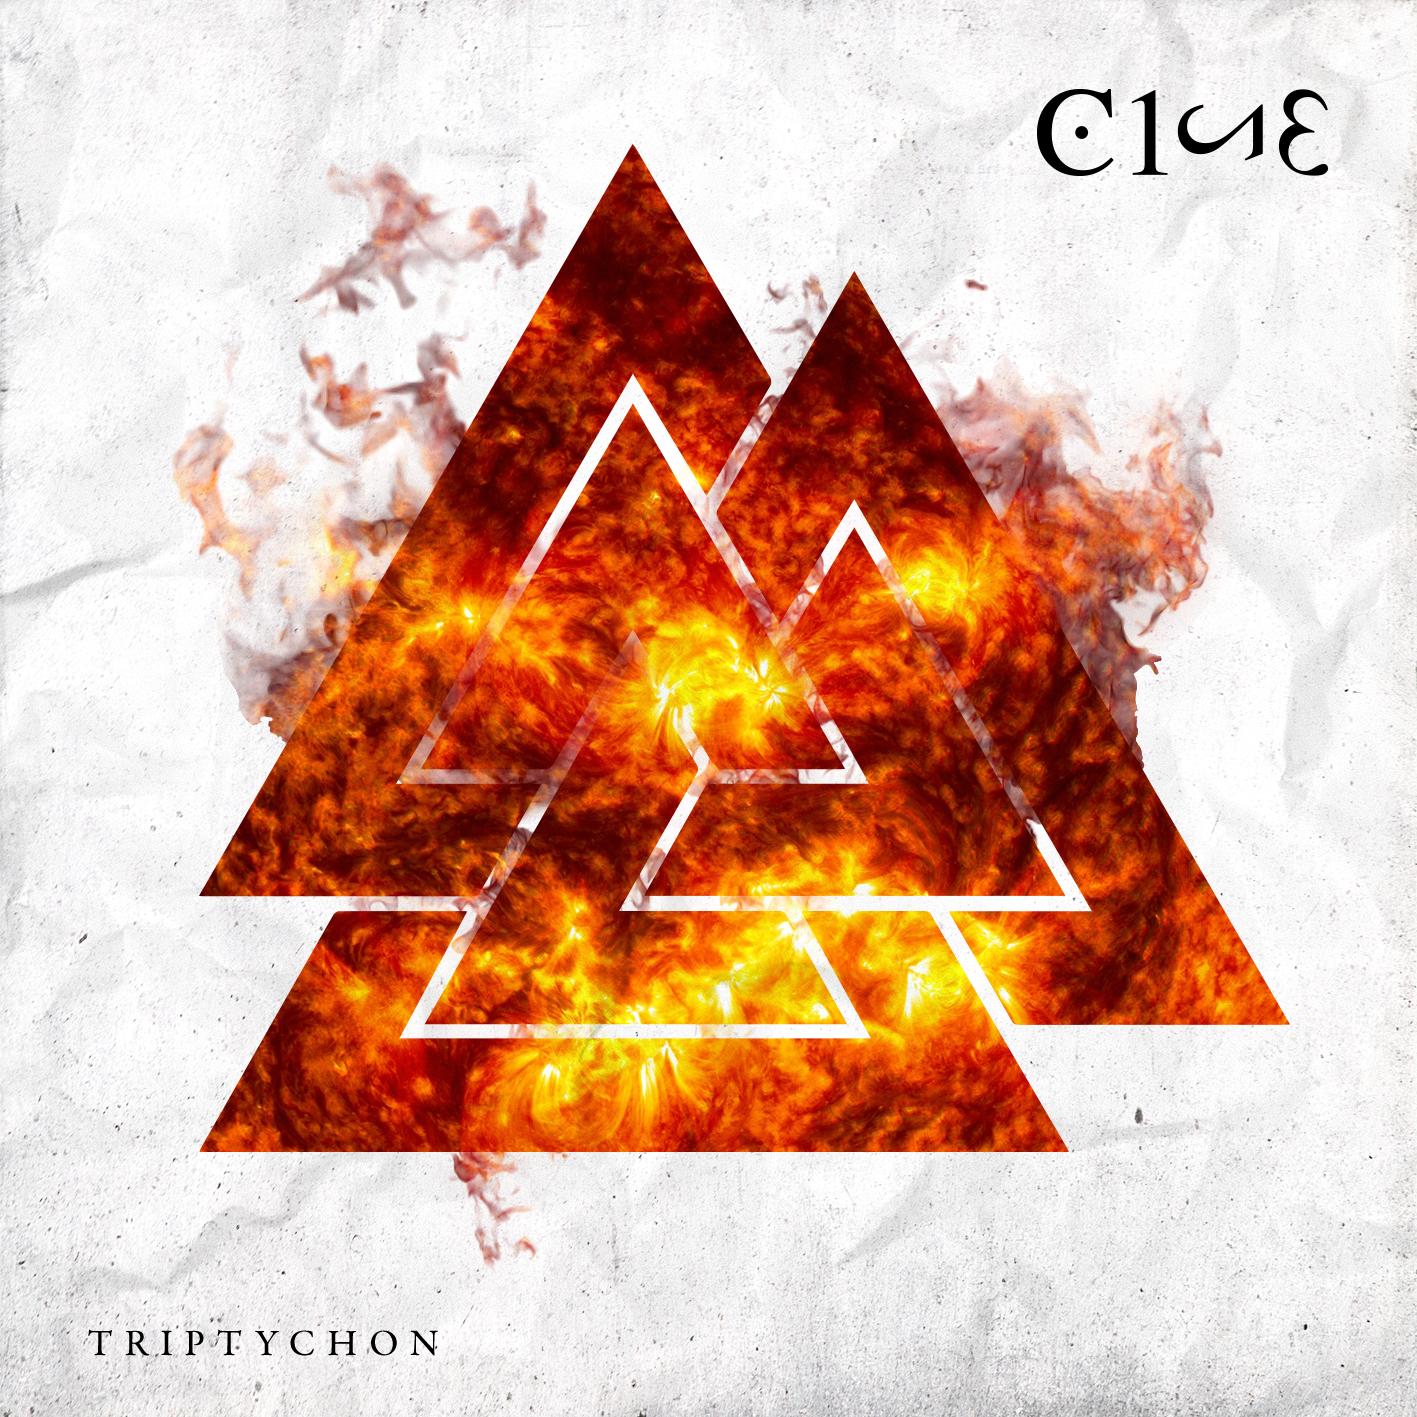 clue_triptychon_2018_cover.jpg